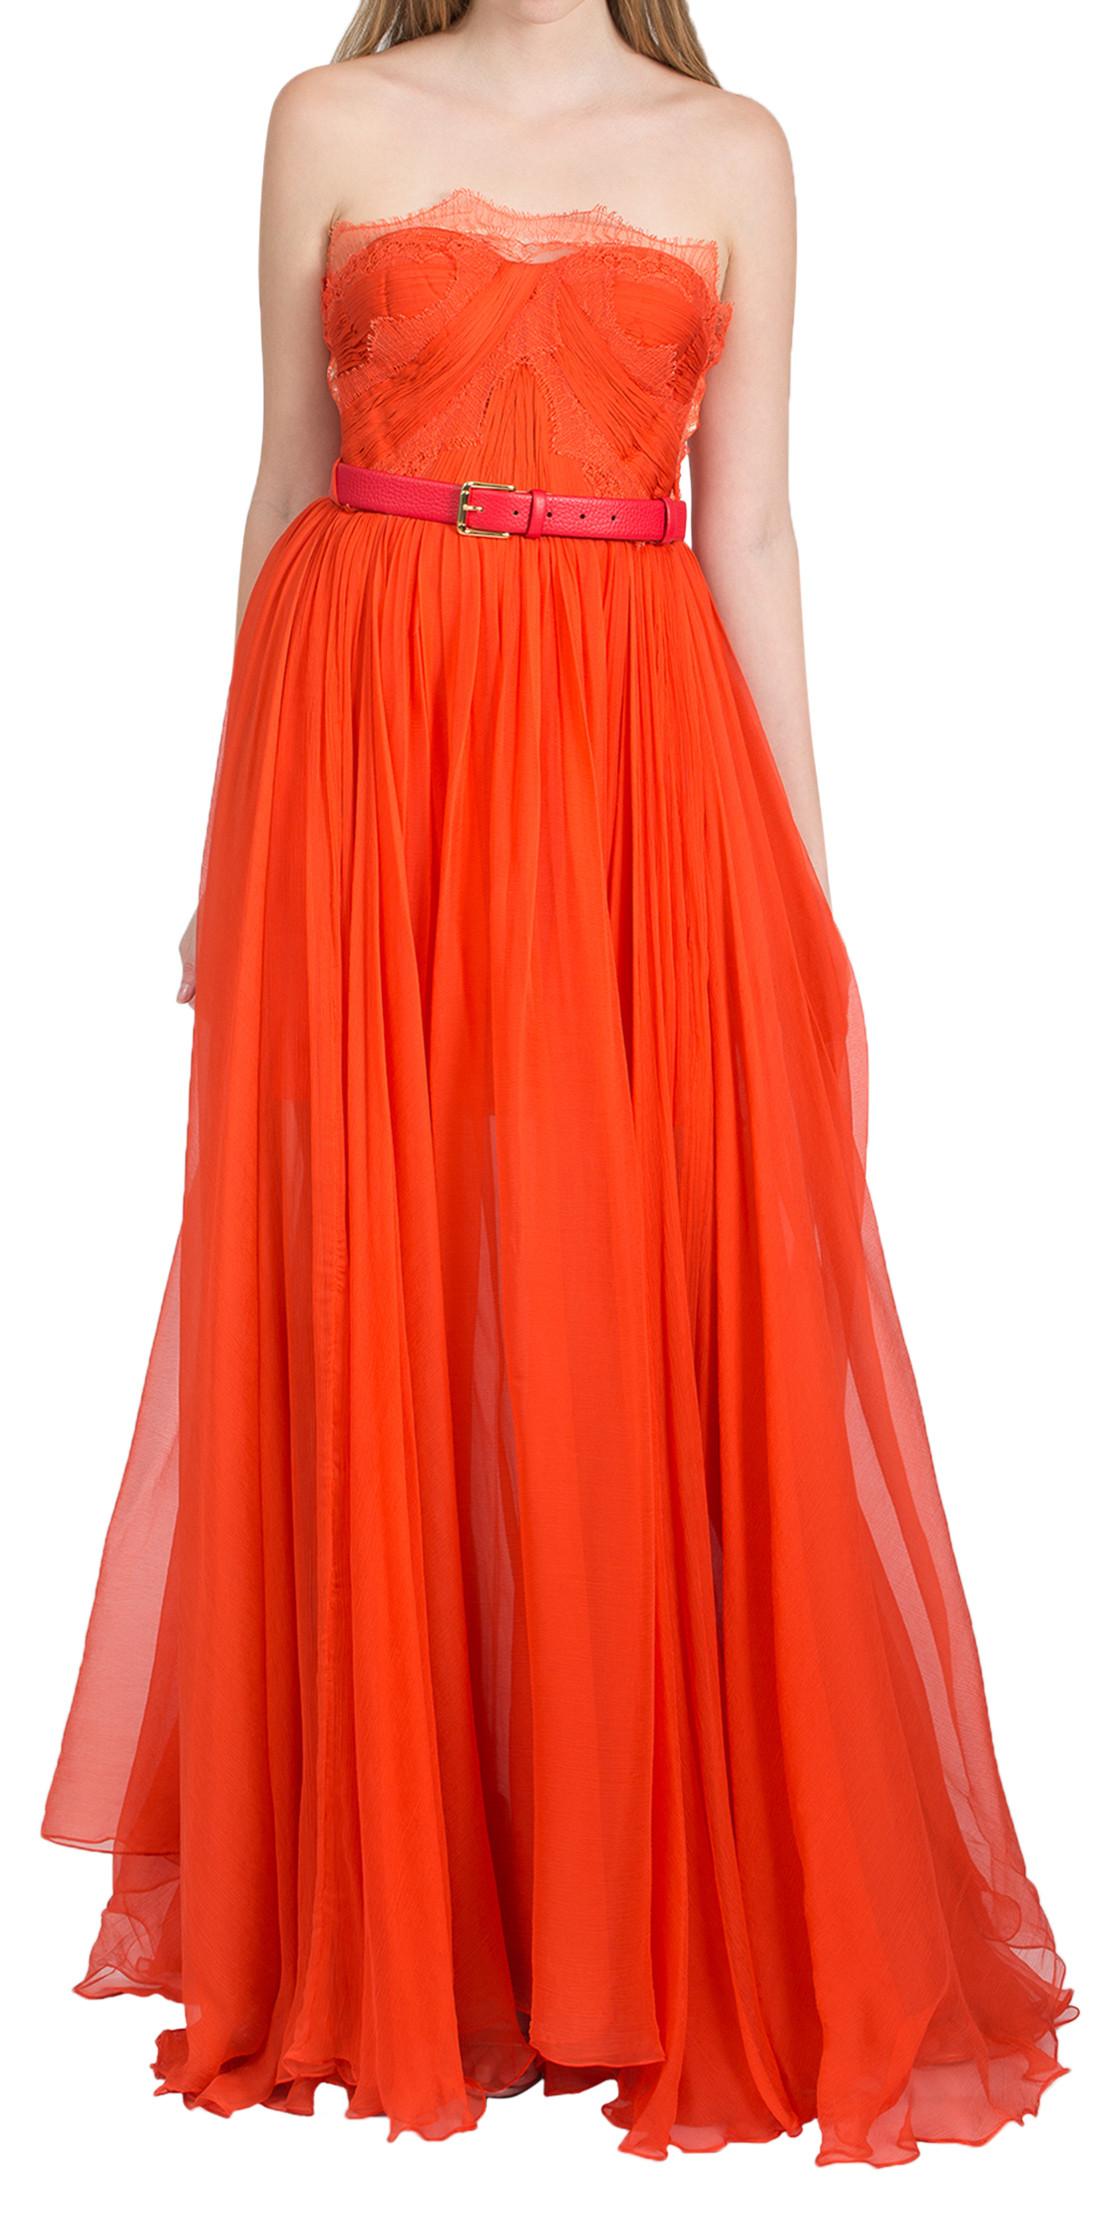 Maria Lucia Hohan Matte Mousseline Dress